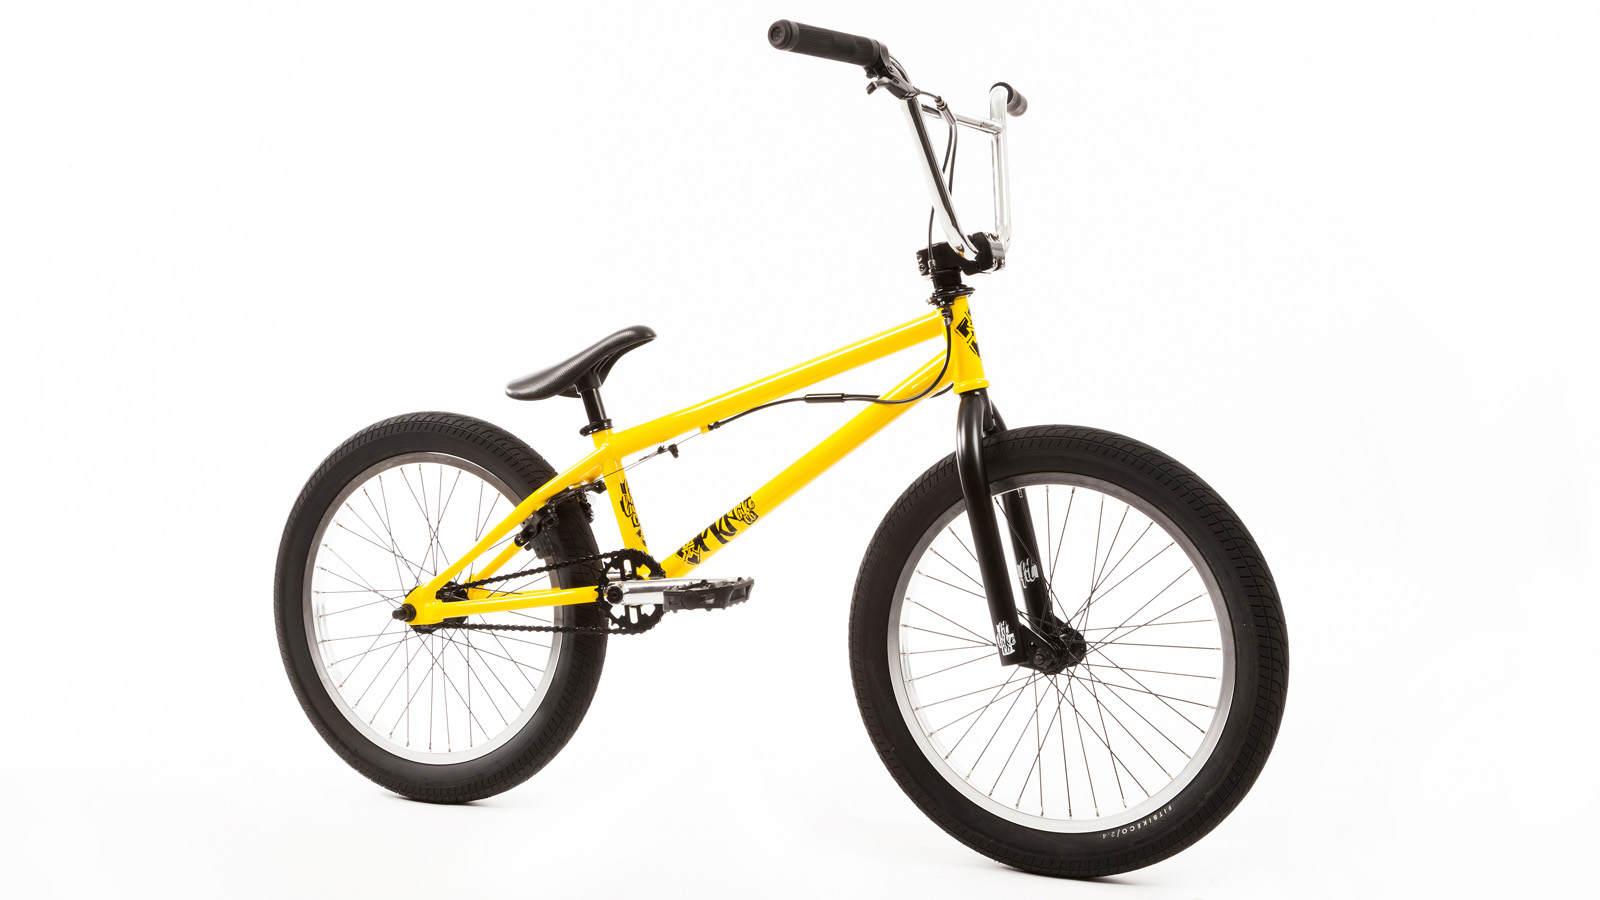 Bicicleta completa BMX Fit Bike Co, PRK. Amarillo ruedas ...